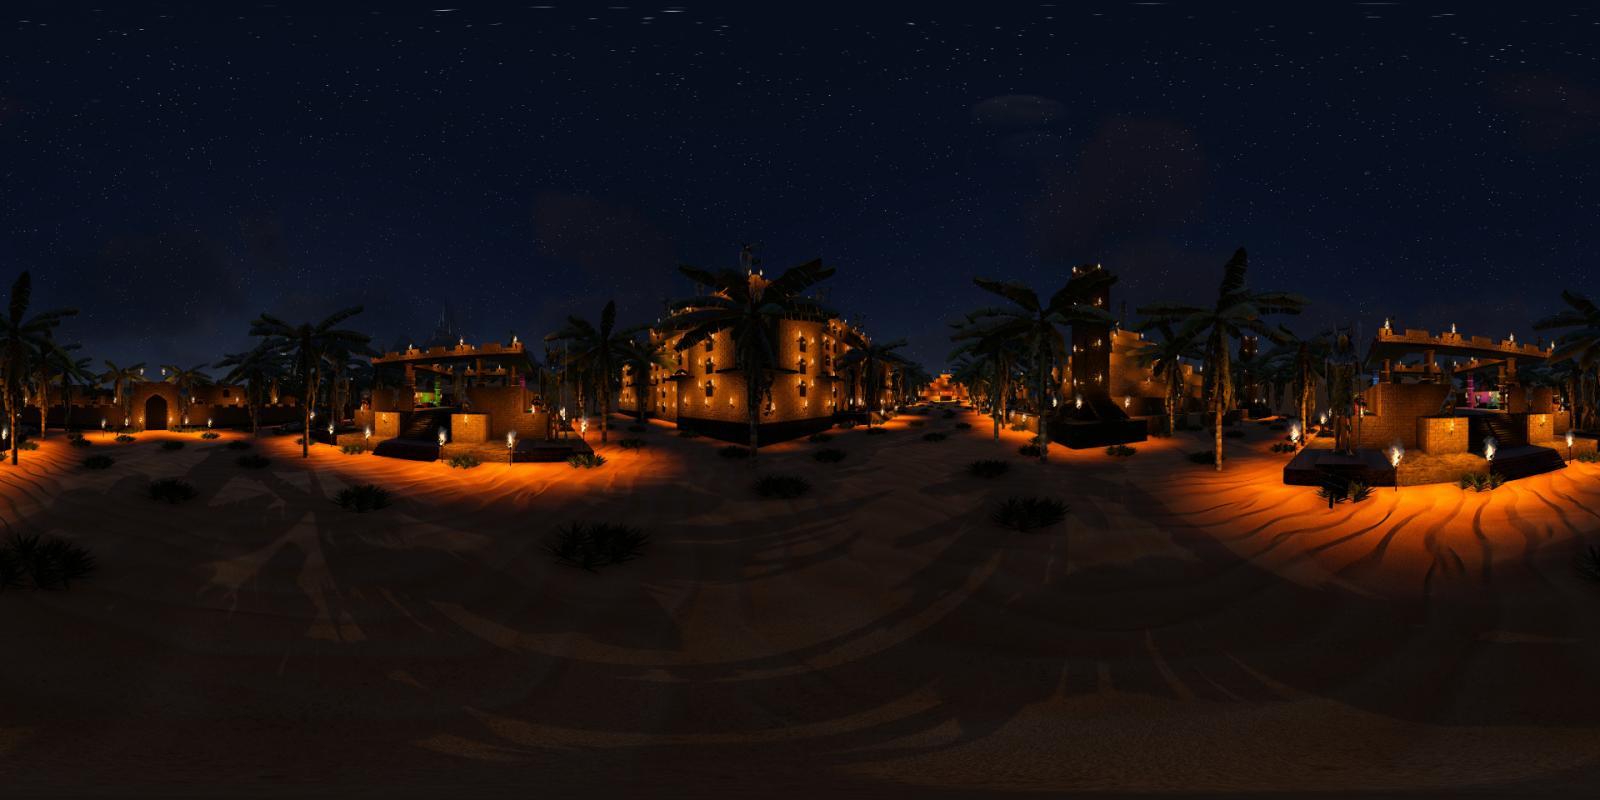 large.58f17d49bfa15_WolfAngelus-EgyptNight-360sta.jpg